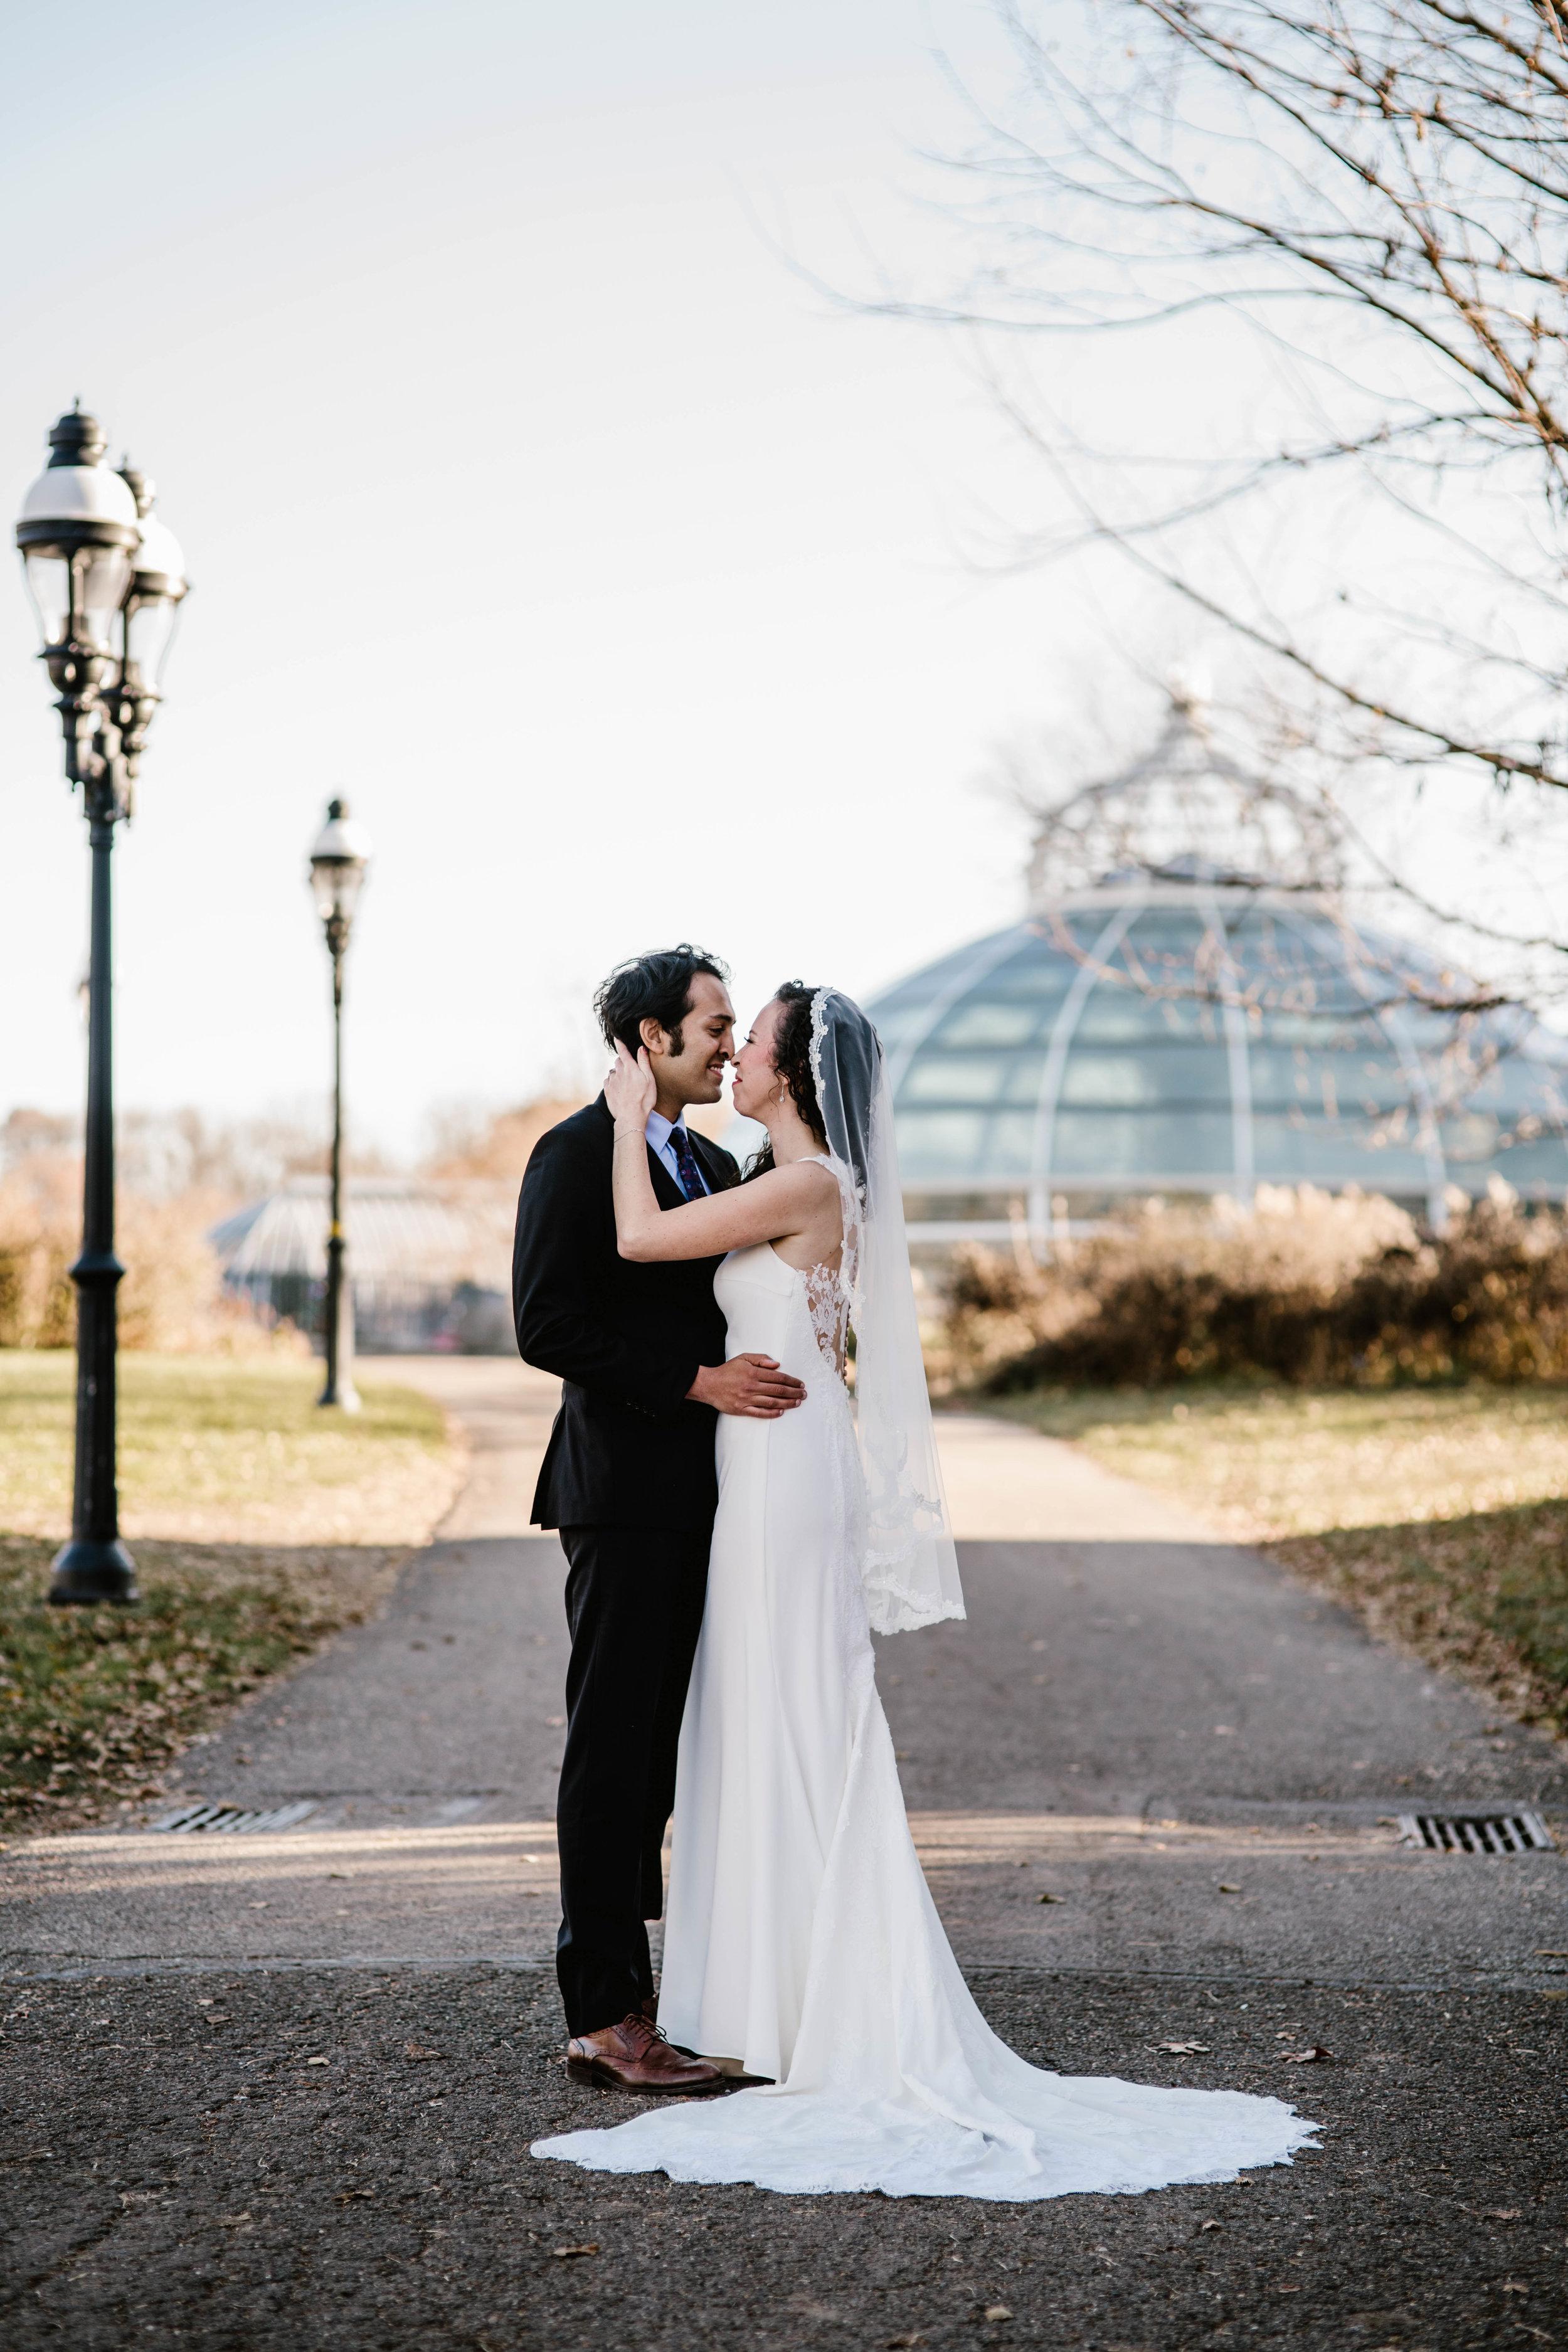 Kristy Lumsden Photography_Pittsburgh Wedding Photographer_43.jpg